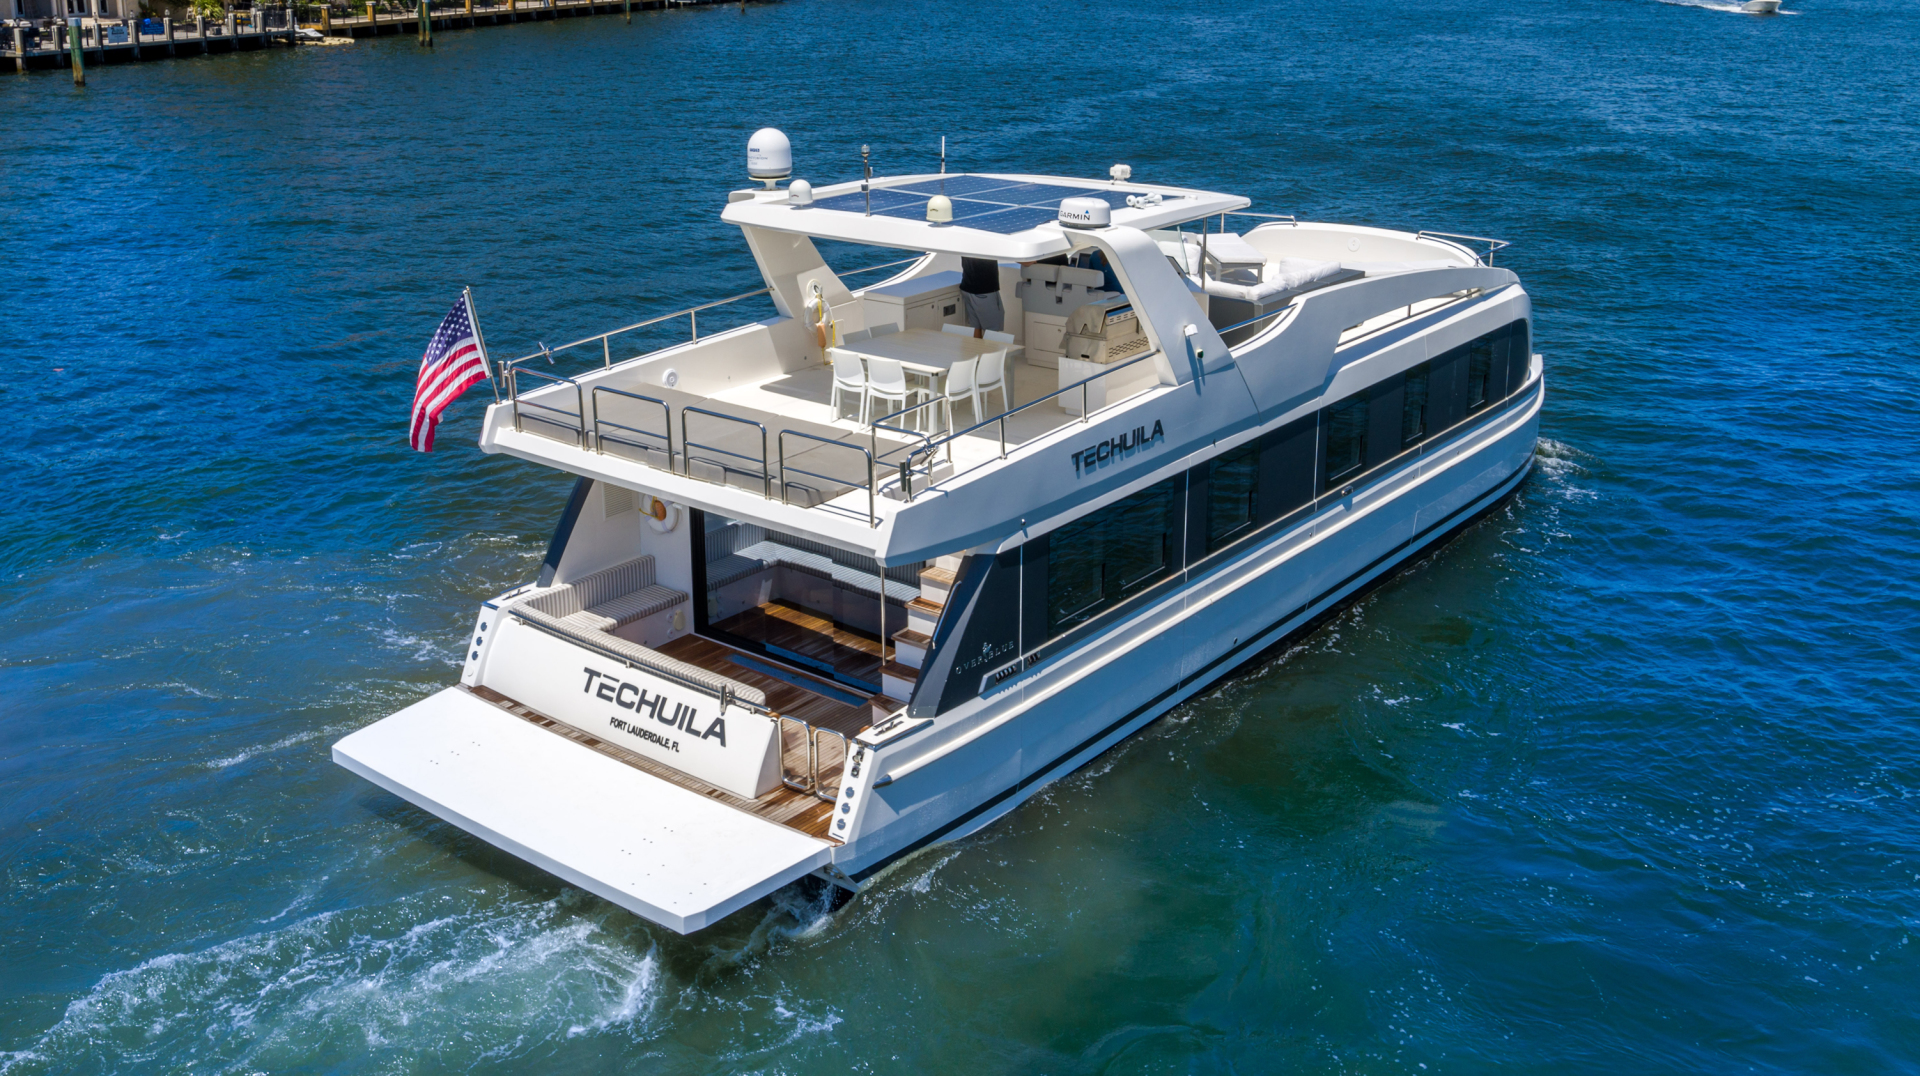 Overblue-58 Power Catamaran 2017-Techuila Ft. Lauderdale-Florida-United States-2017 Overblue 58 Powercat-1401121   Thumbnail